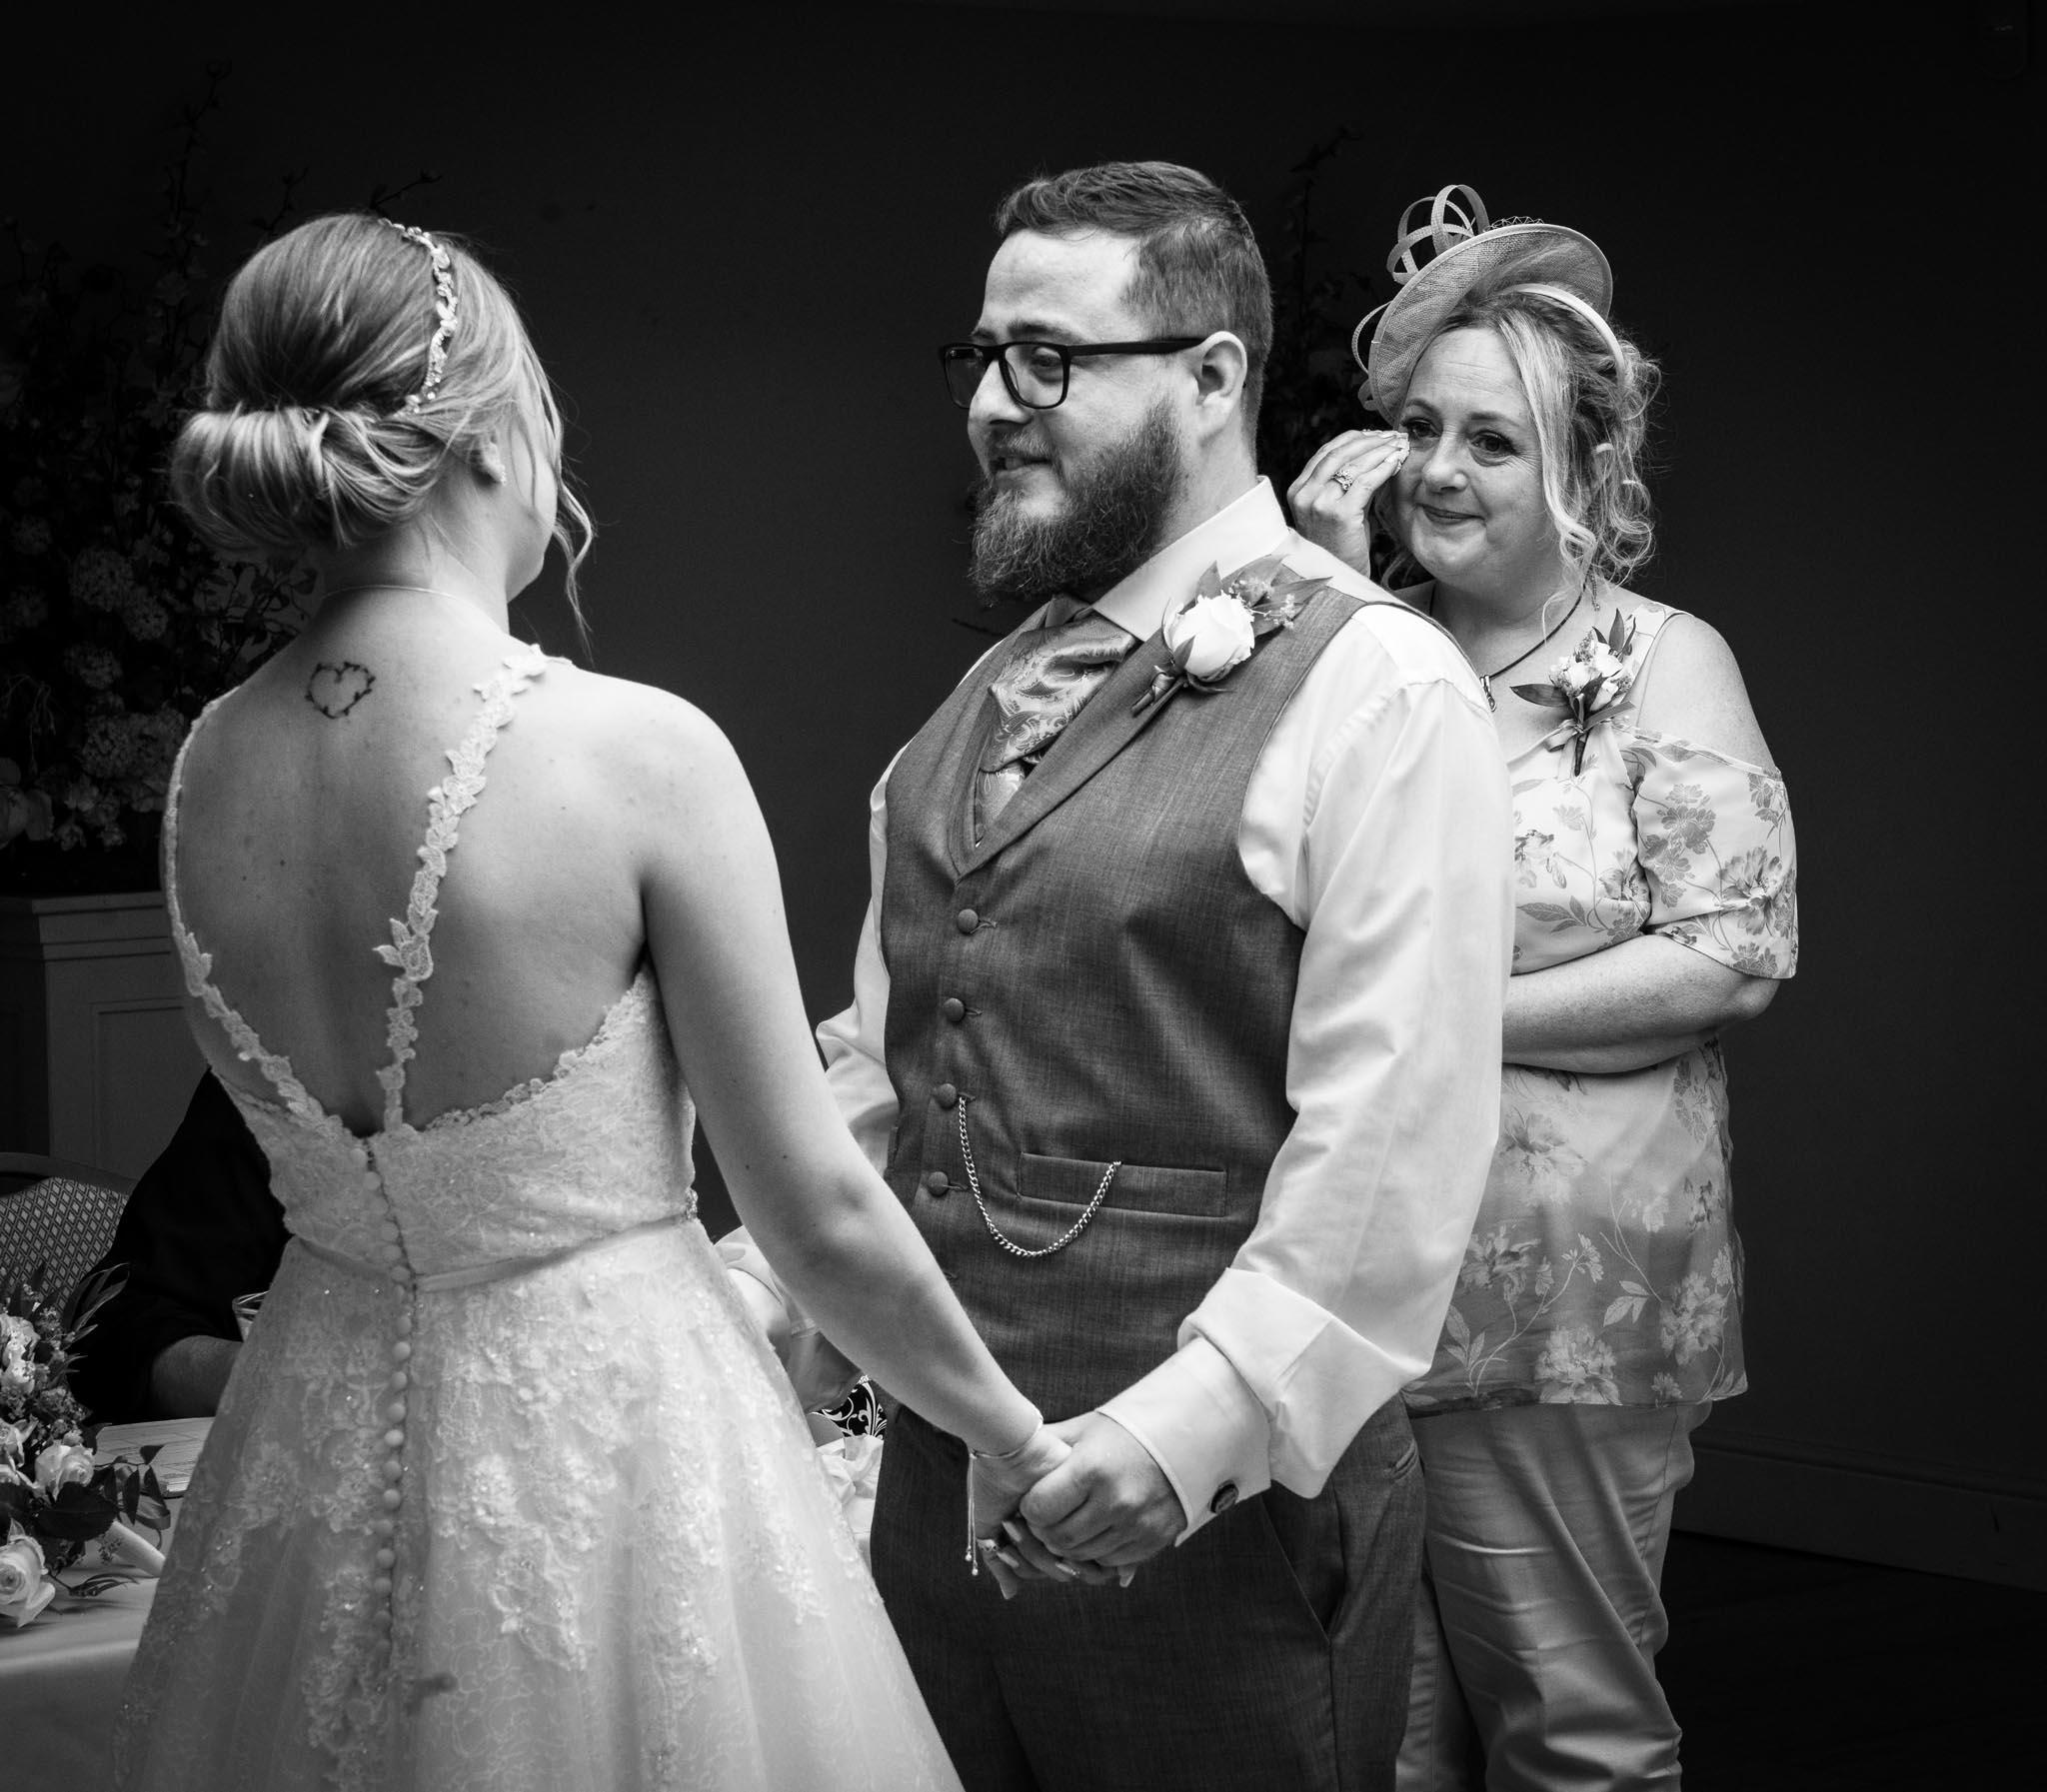 342-Ceremony-Luke-Yasmin-The-Rayleigh-Club-Wedding-Photography.jpg